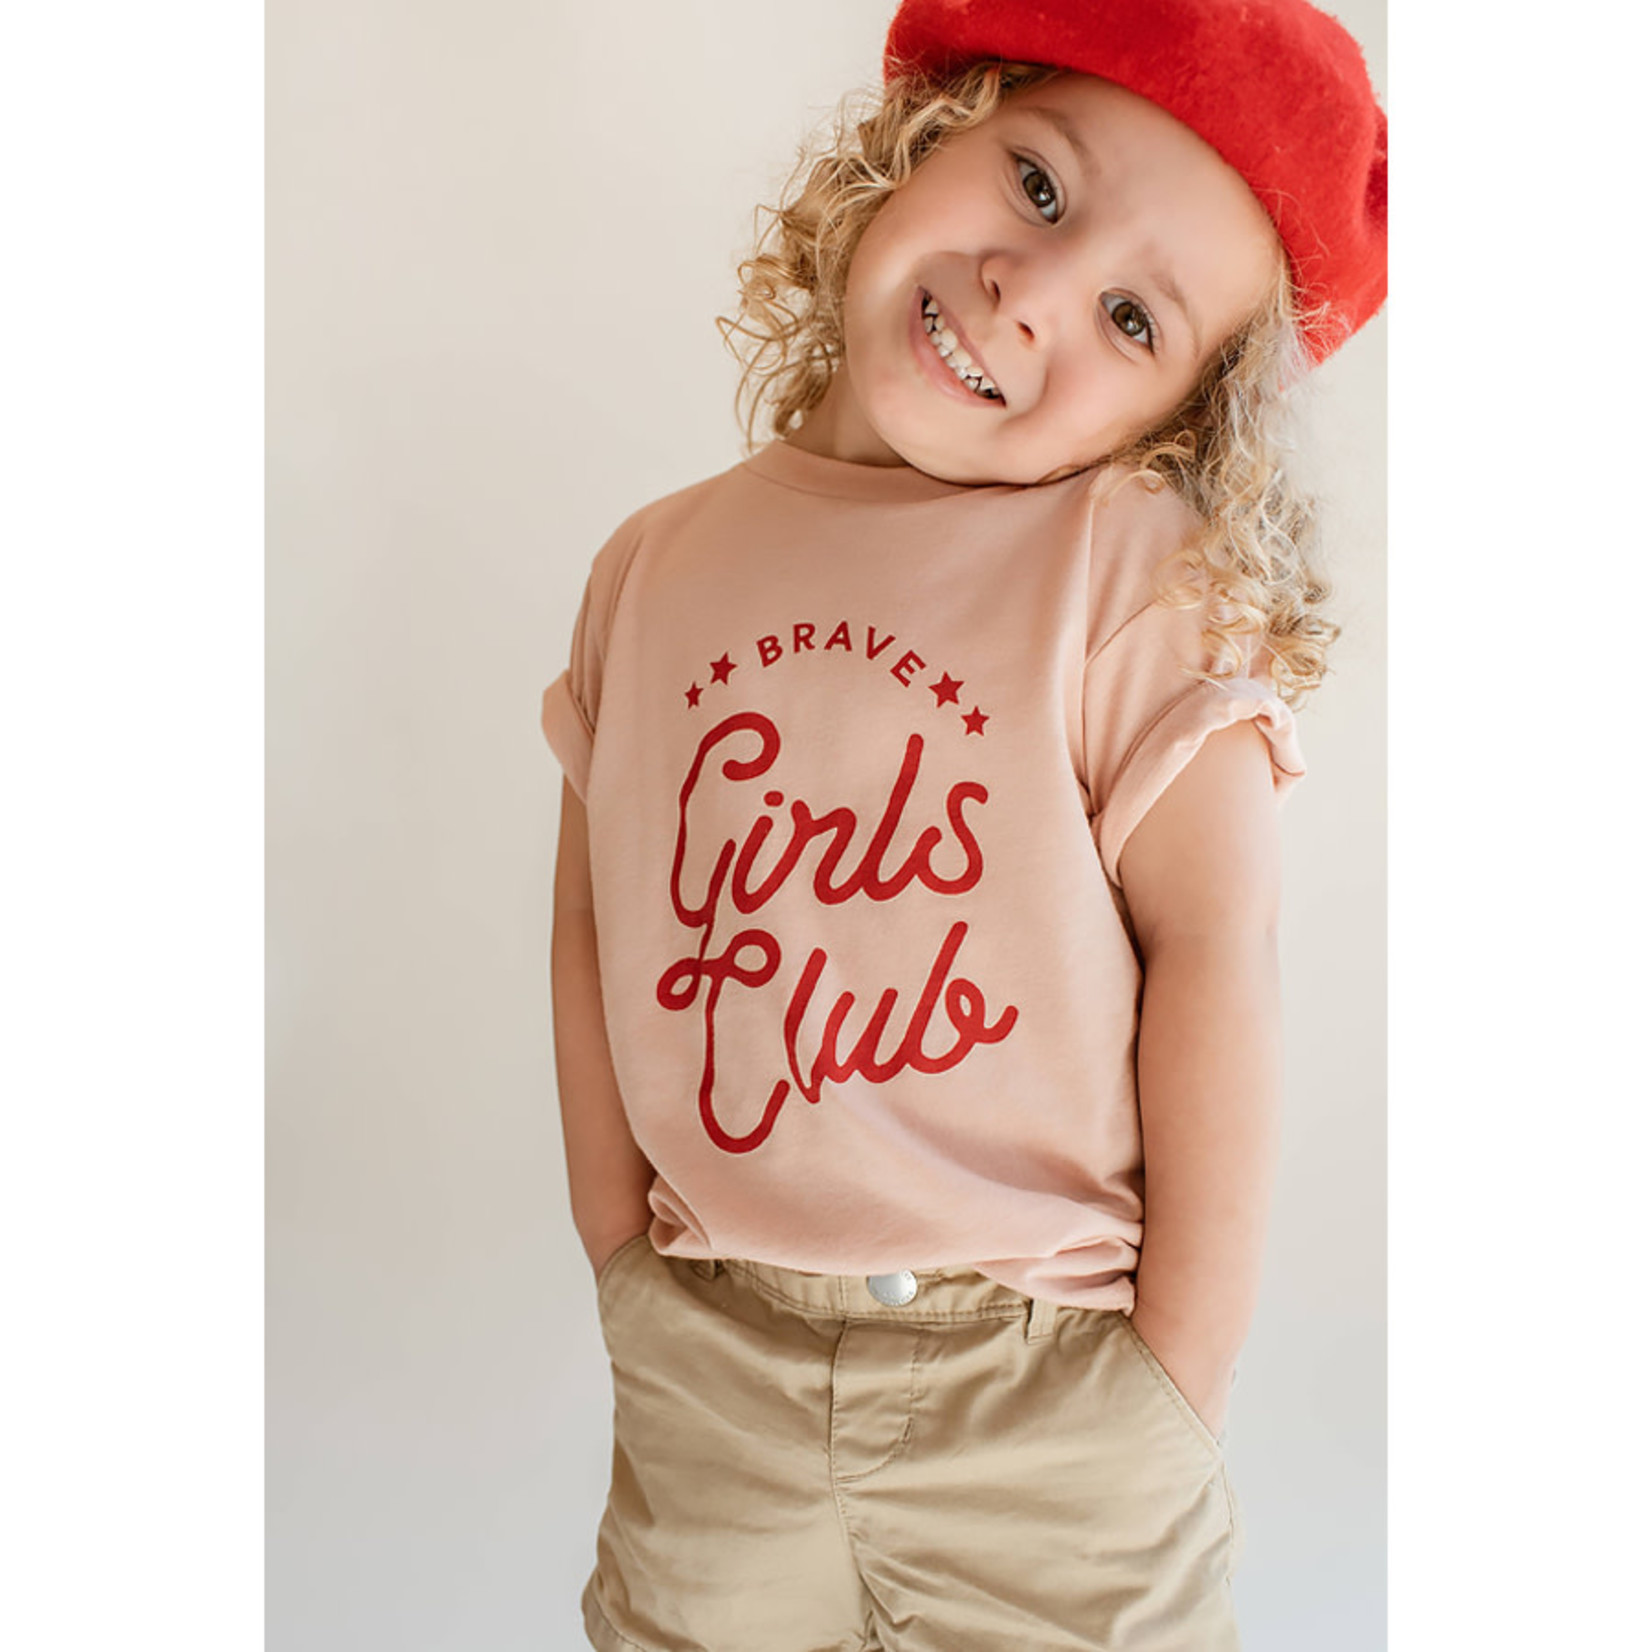 Polished Prints Brave Girls Club Toddler Tee